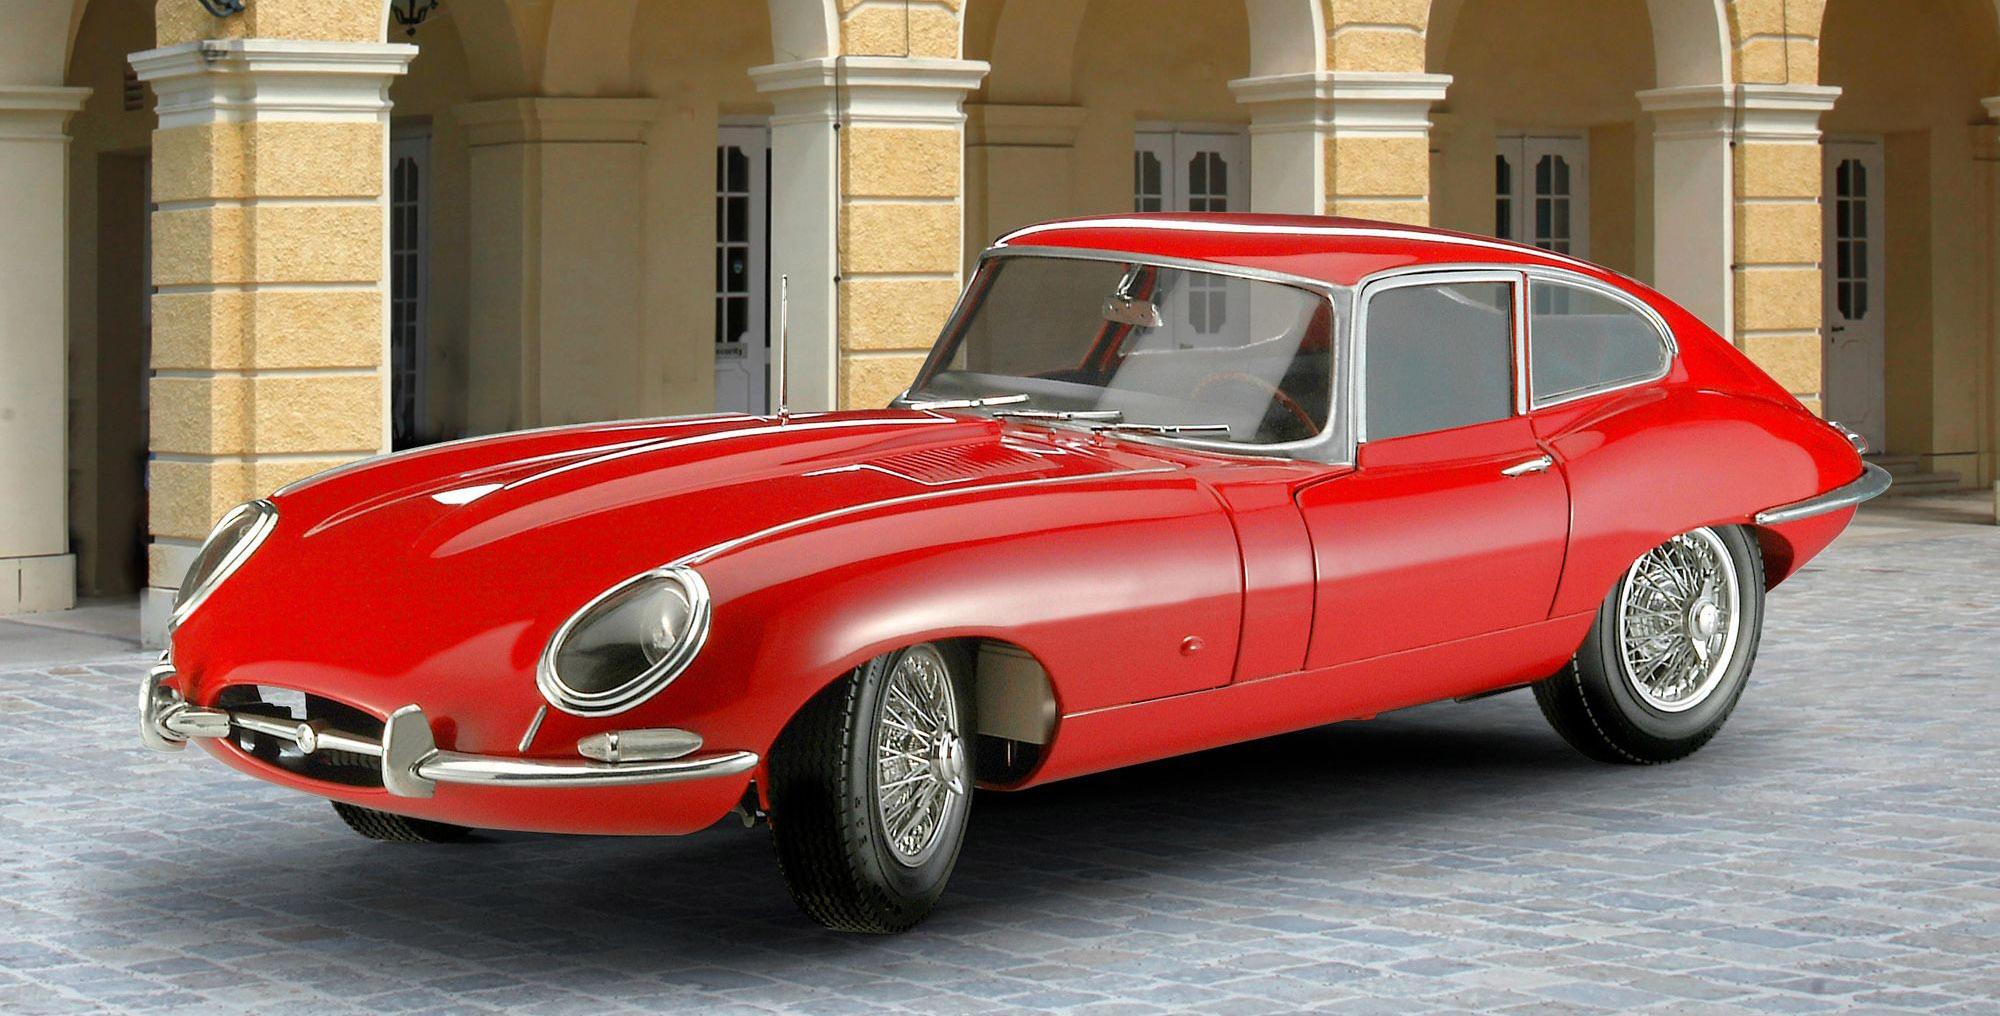 07668-Jaguar-E-Type-Coupe Revell-Neuheiten 2020